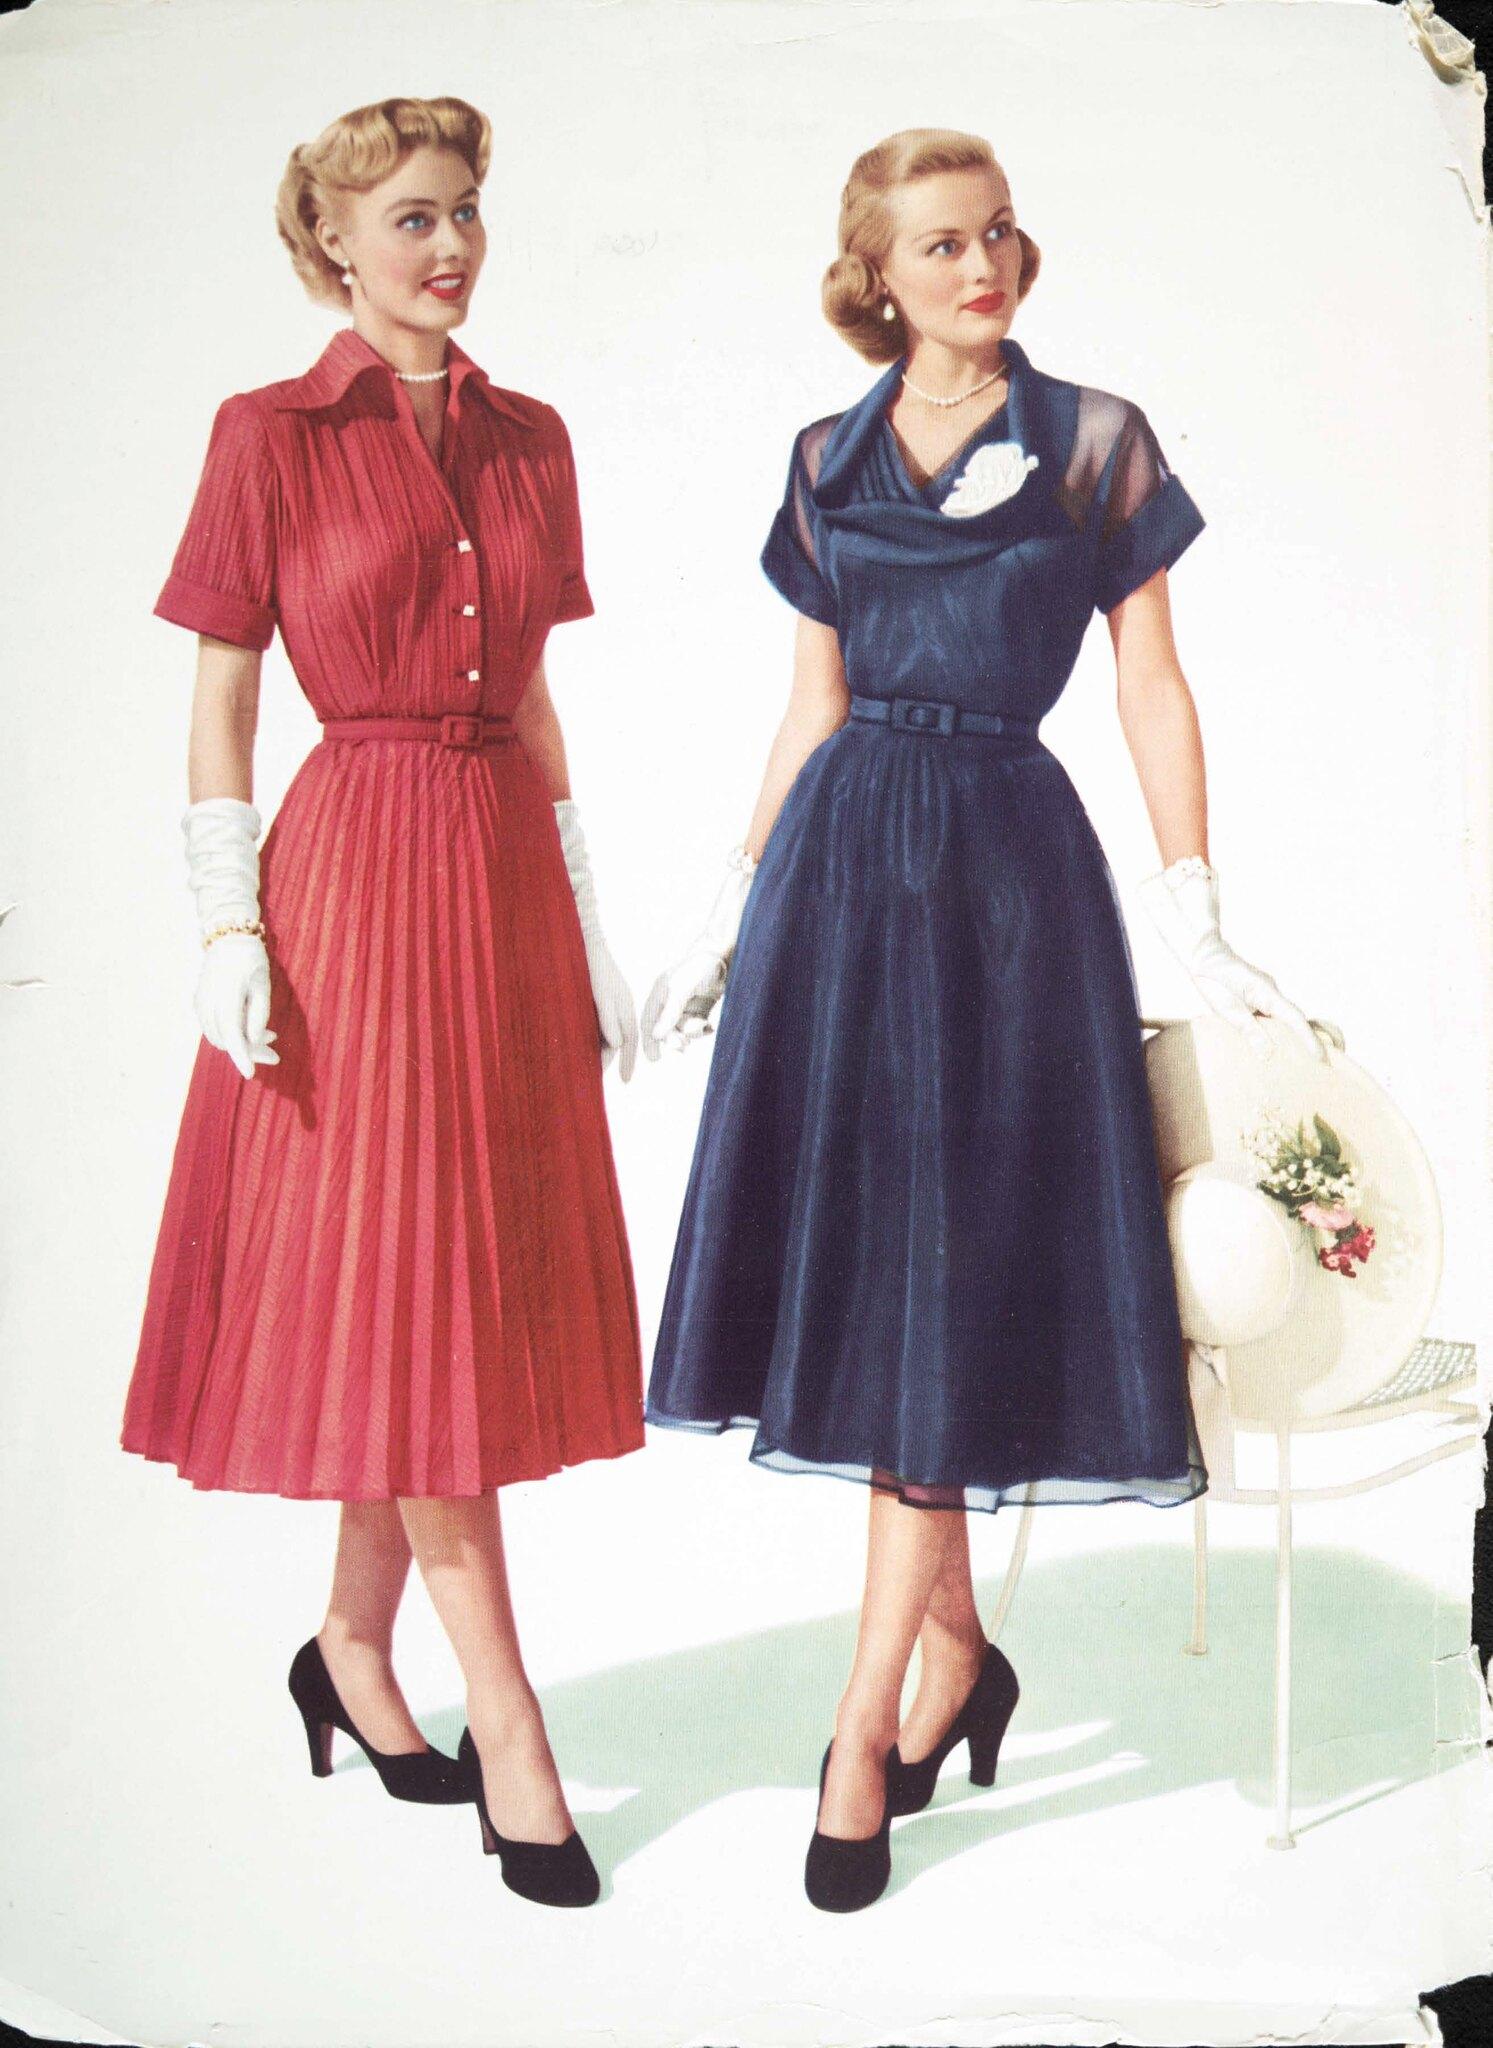 vintage for concert on 1940s 1940s fashion